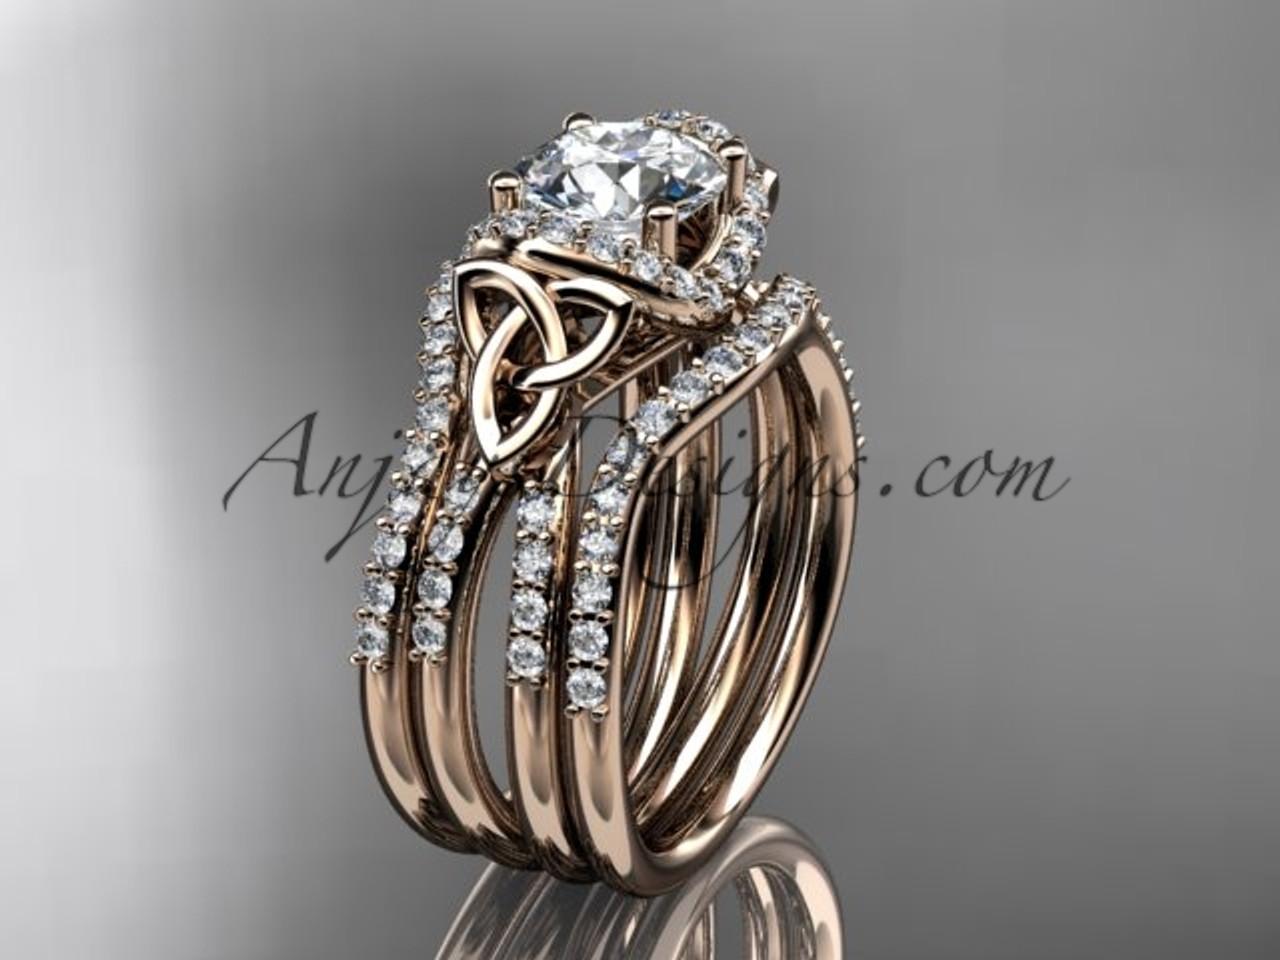 Matching Wedding Band Sets Rose Gold Celtic Ring Ct7155s